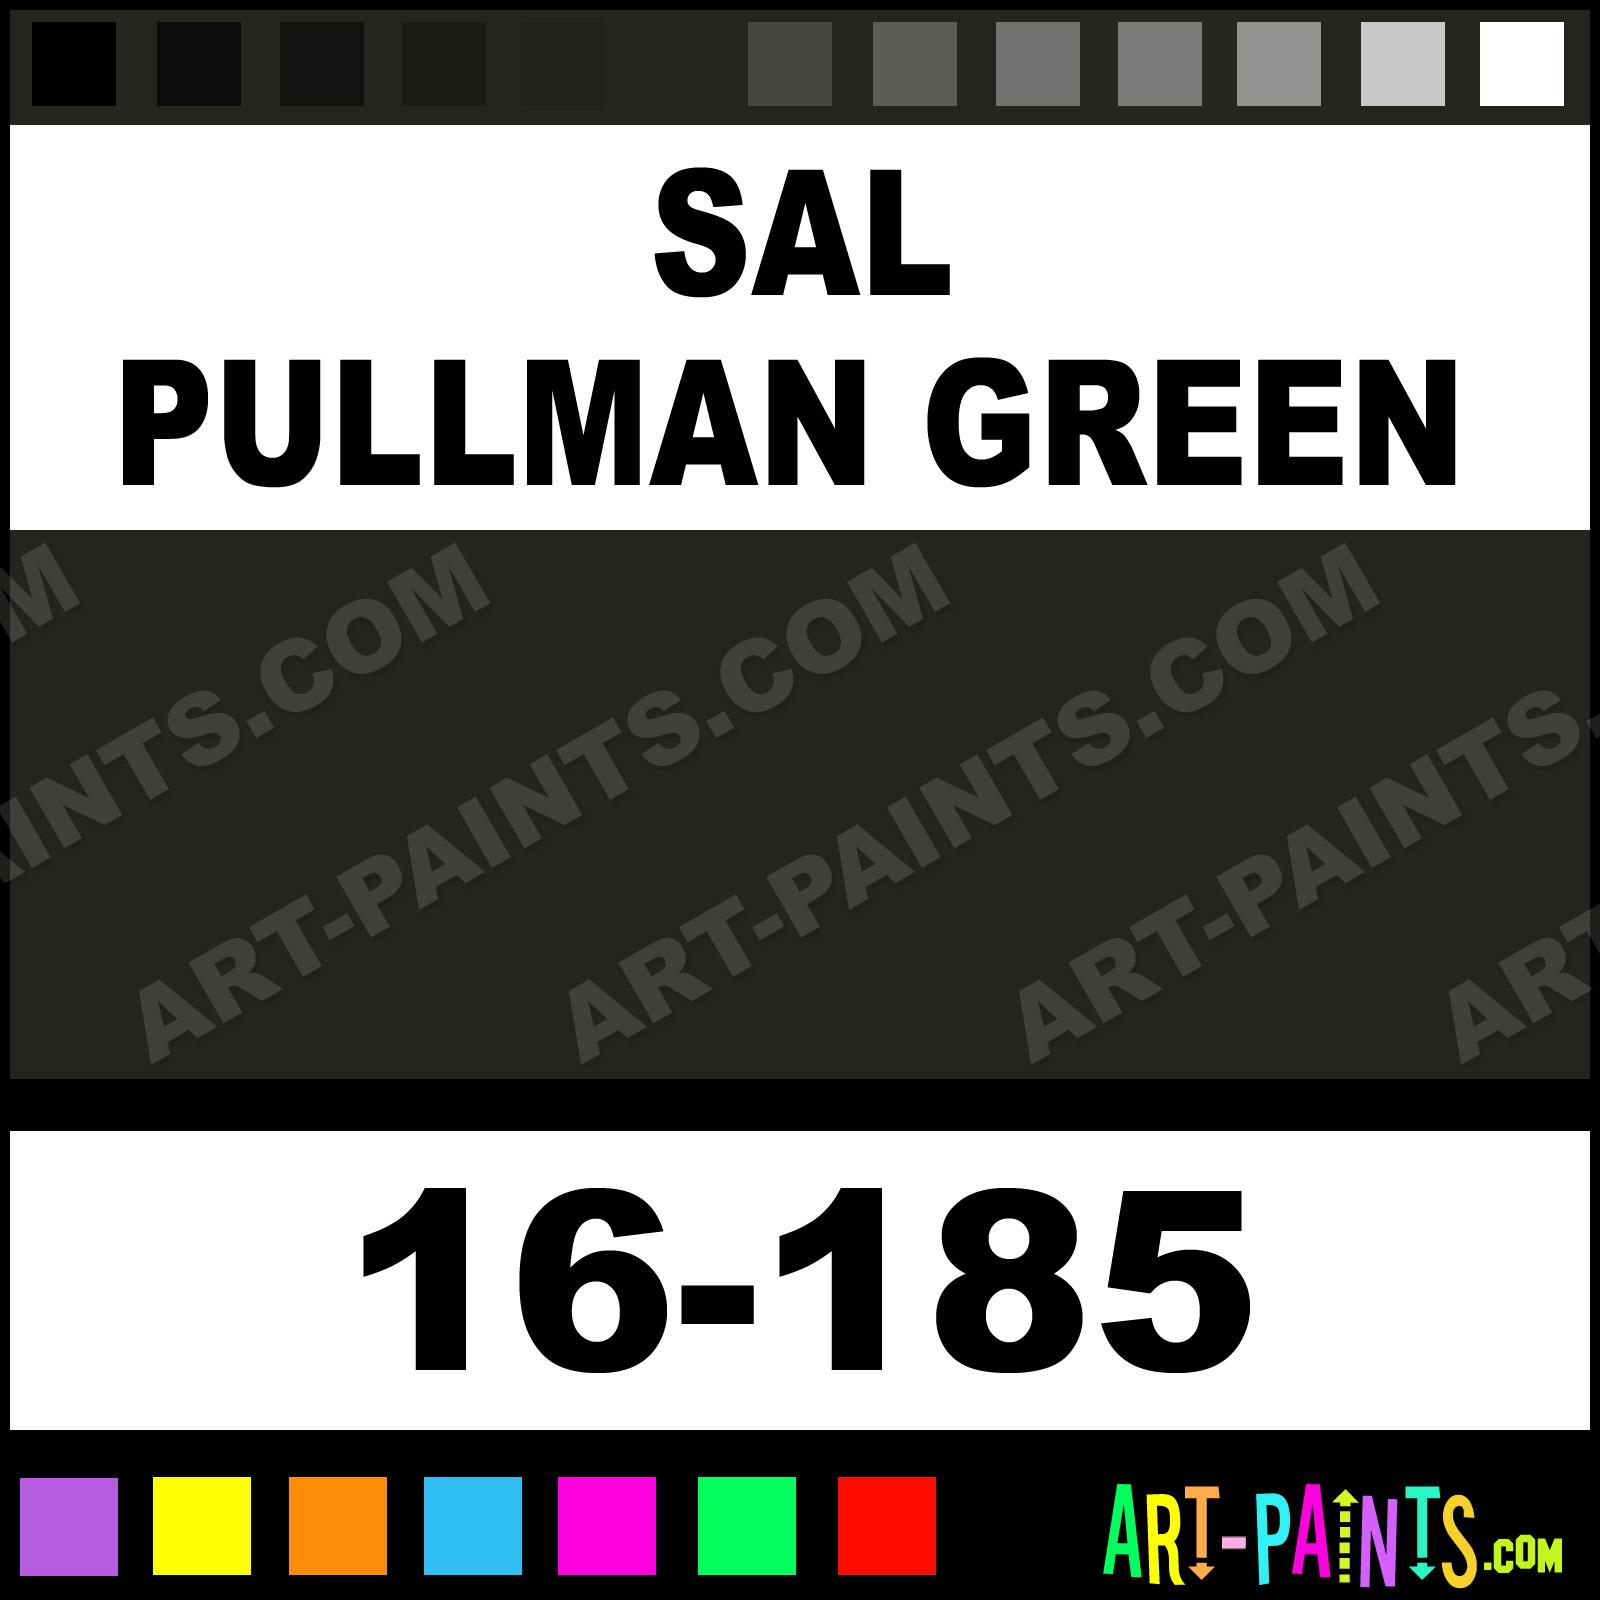 Sal Pullman Green ModelFlex Railroad Airbrush Spray Paints